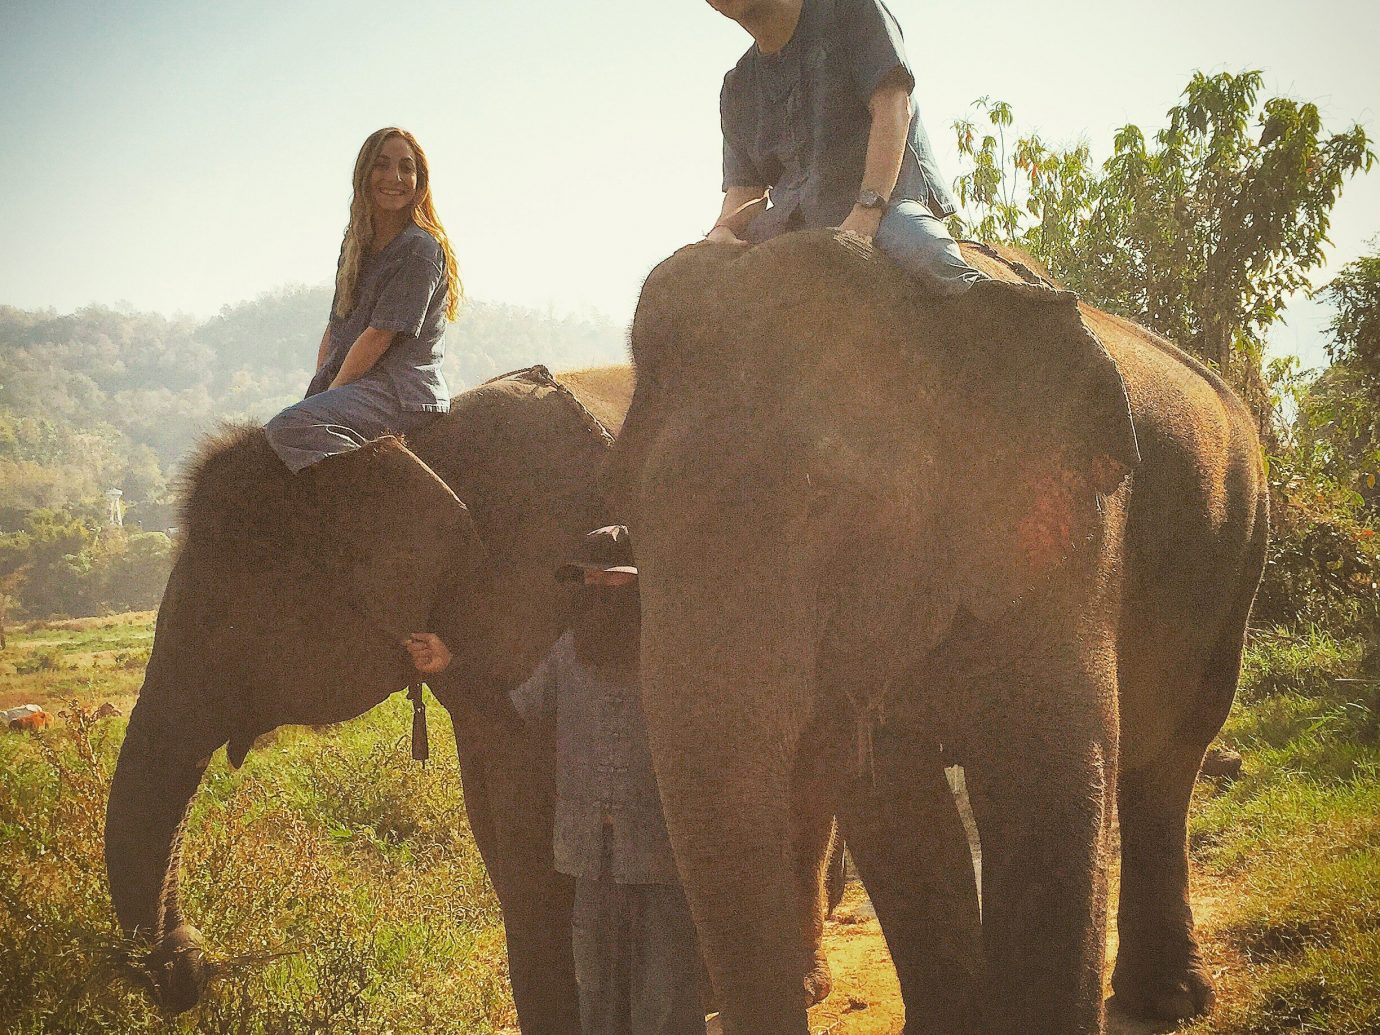 Trip Ideas outdoor elephant sky indian elephant mammal animal elephants and mammoths fauna Wildlife Safari mahout Adventure african elephant Camel